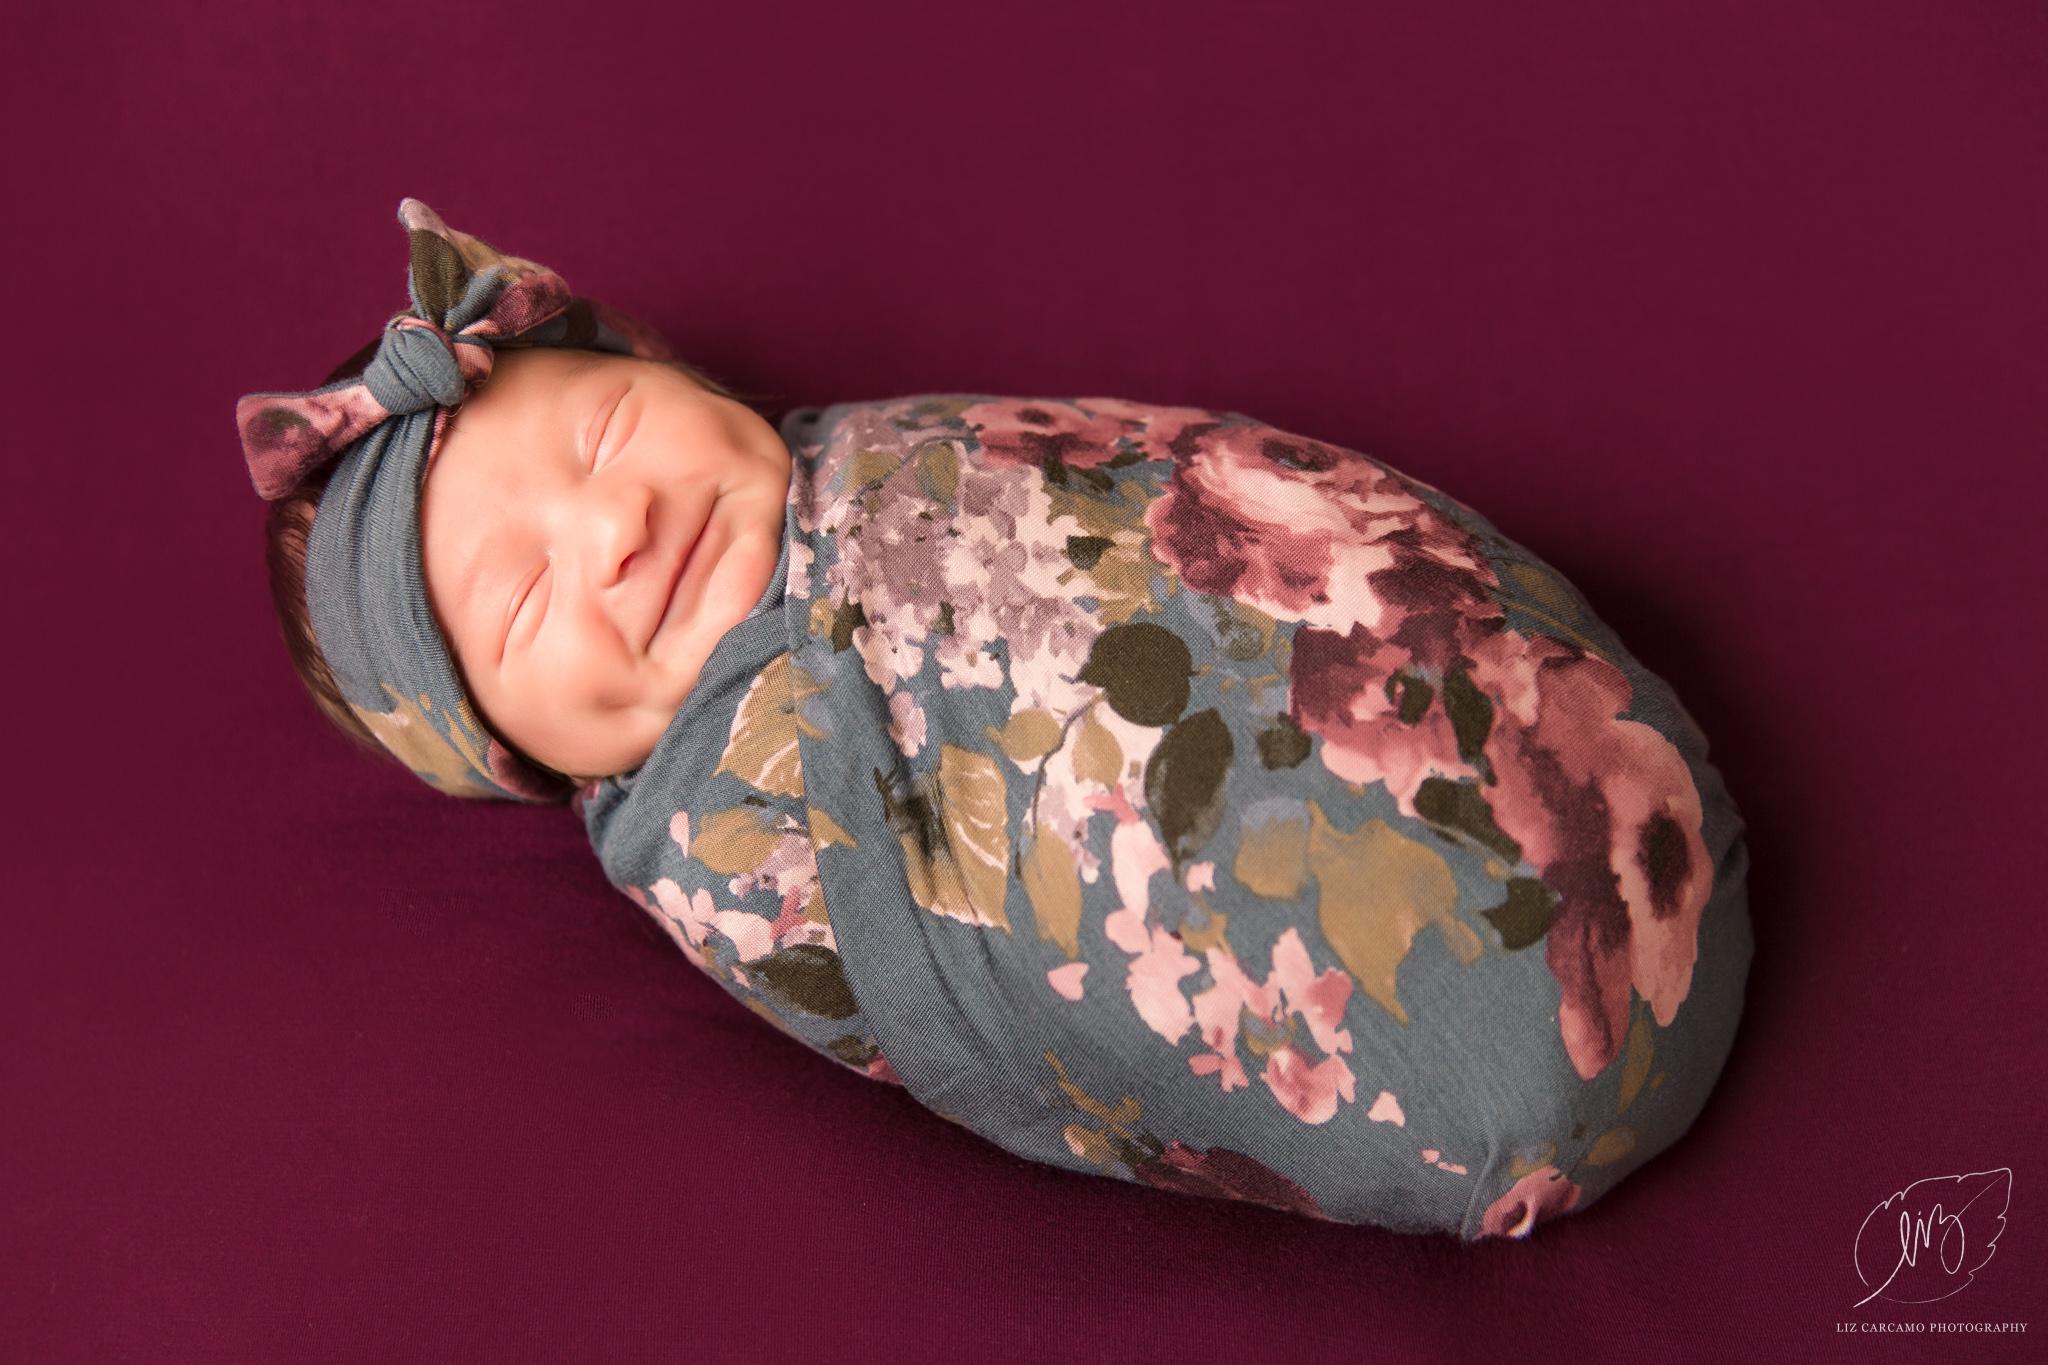 Inland-Empire-Newborn-Photographer (1).jpg